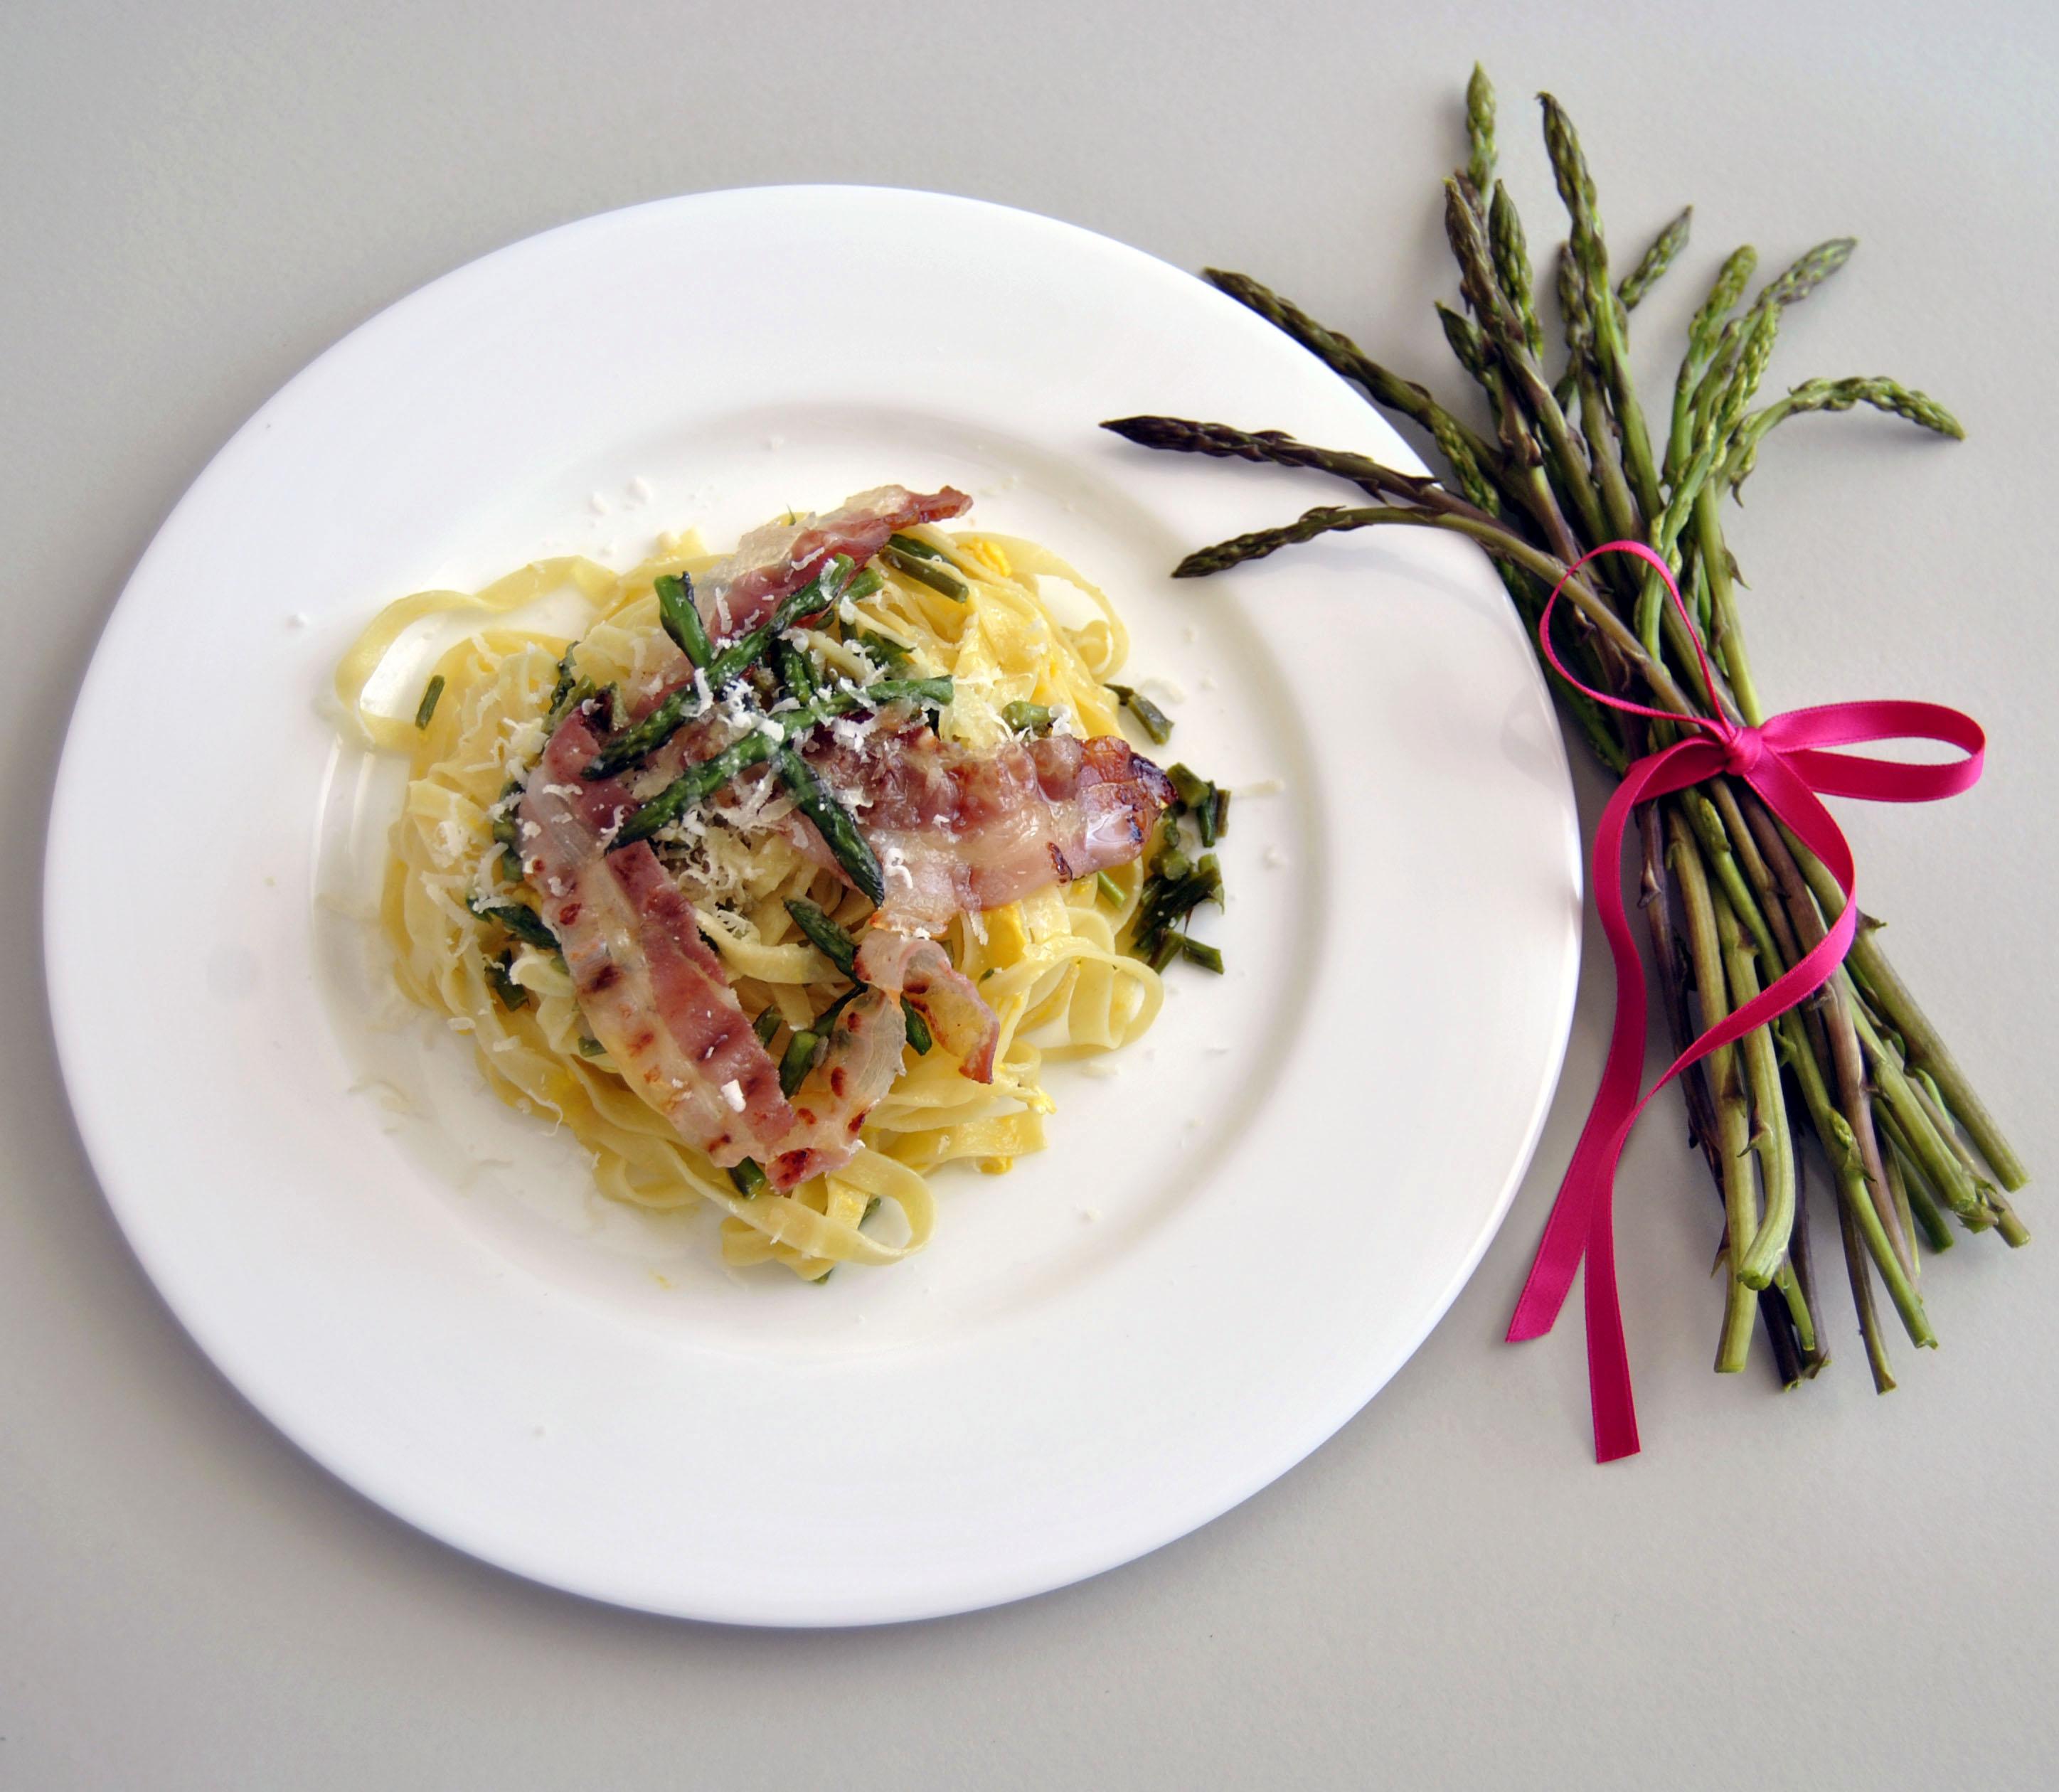 asparagi selvatici per dietare